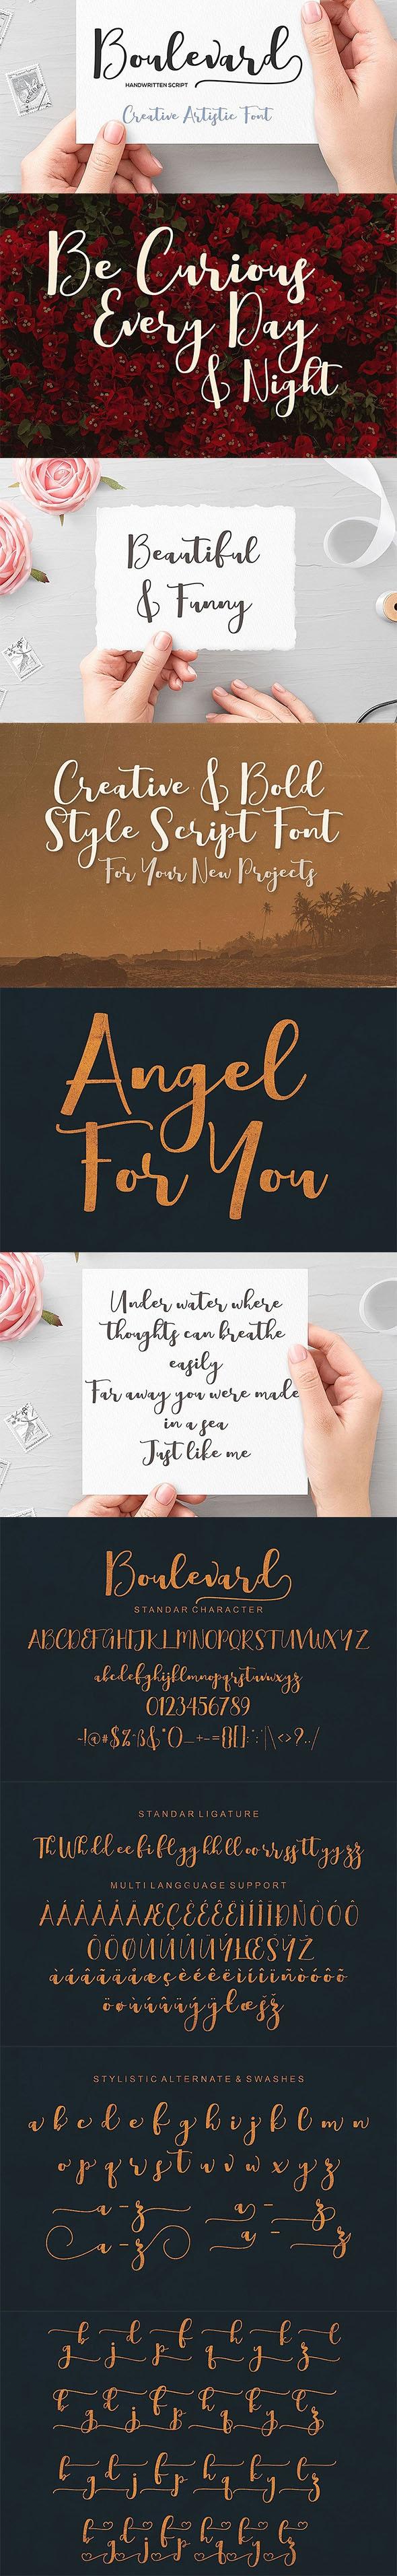 Boulevard Script Font - Hand-writing Script